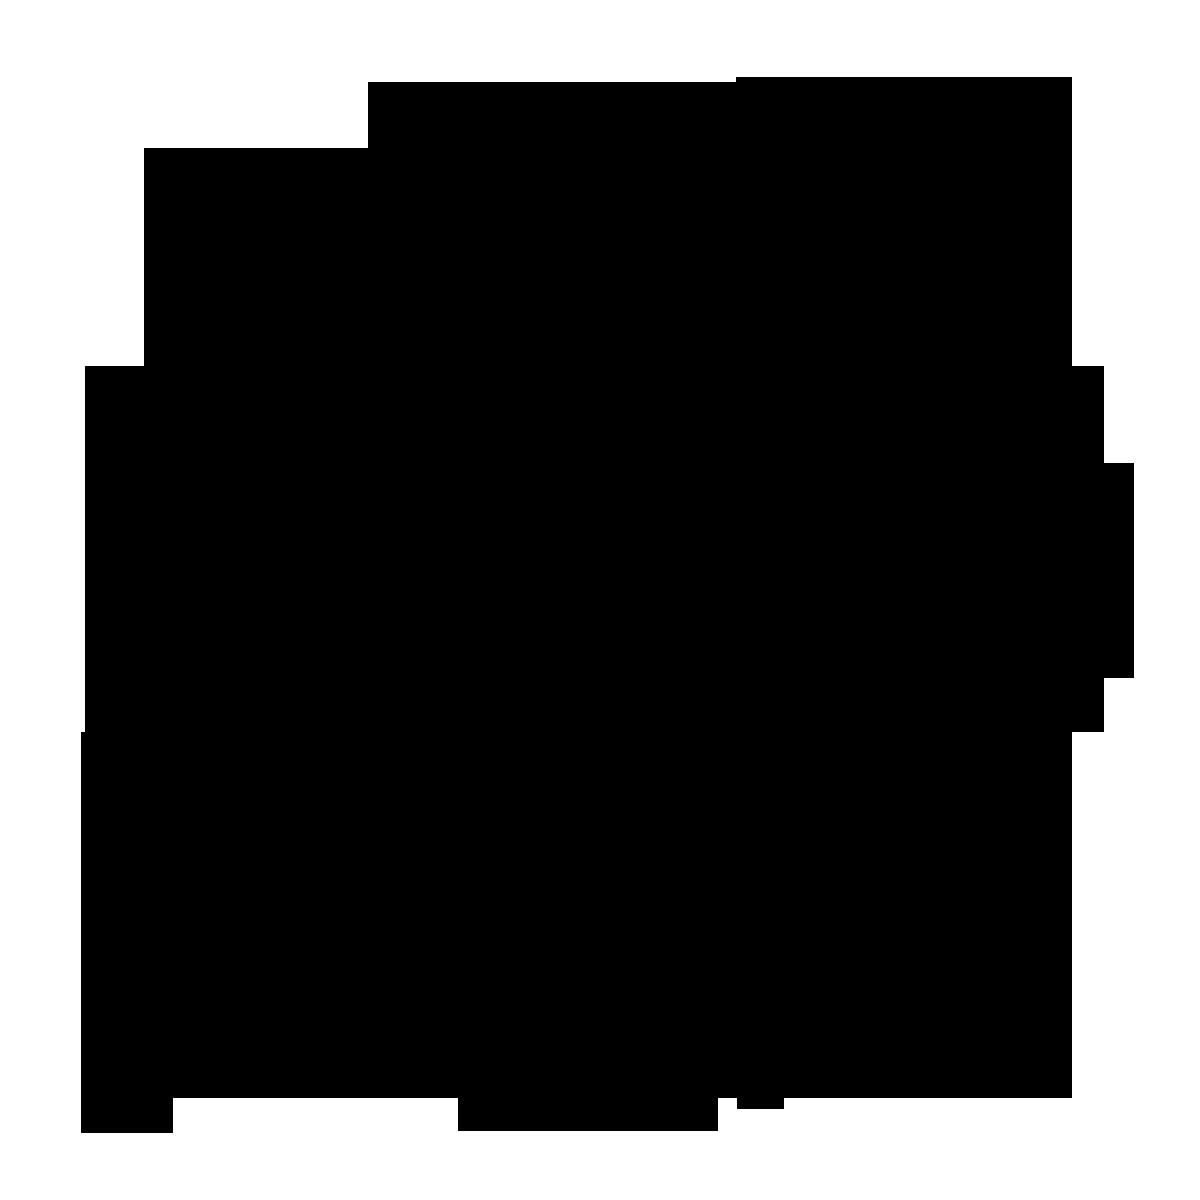 OPCLMDSC_logo-in-square_Black_1200px